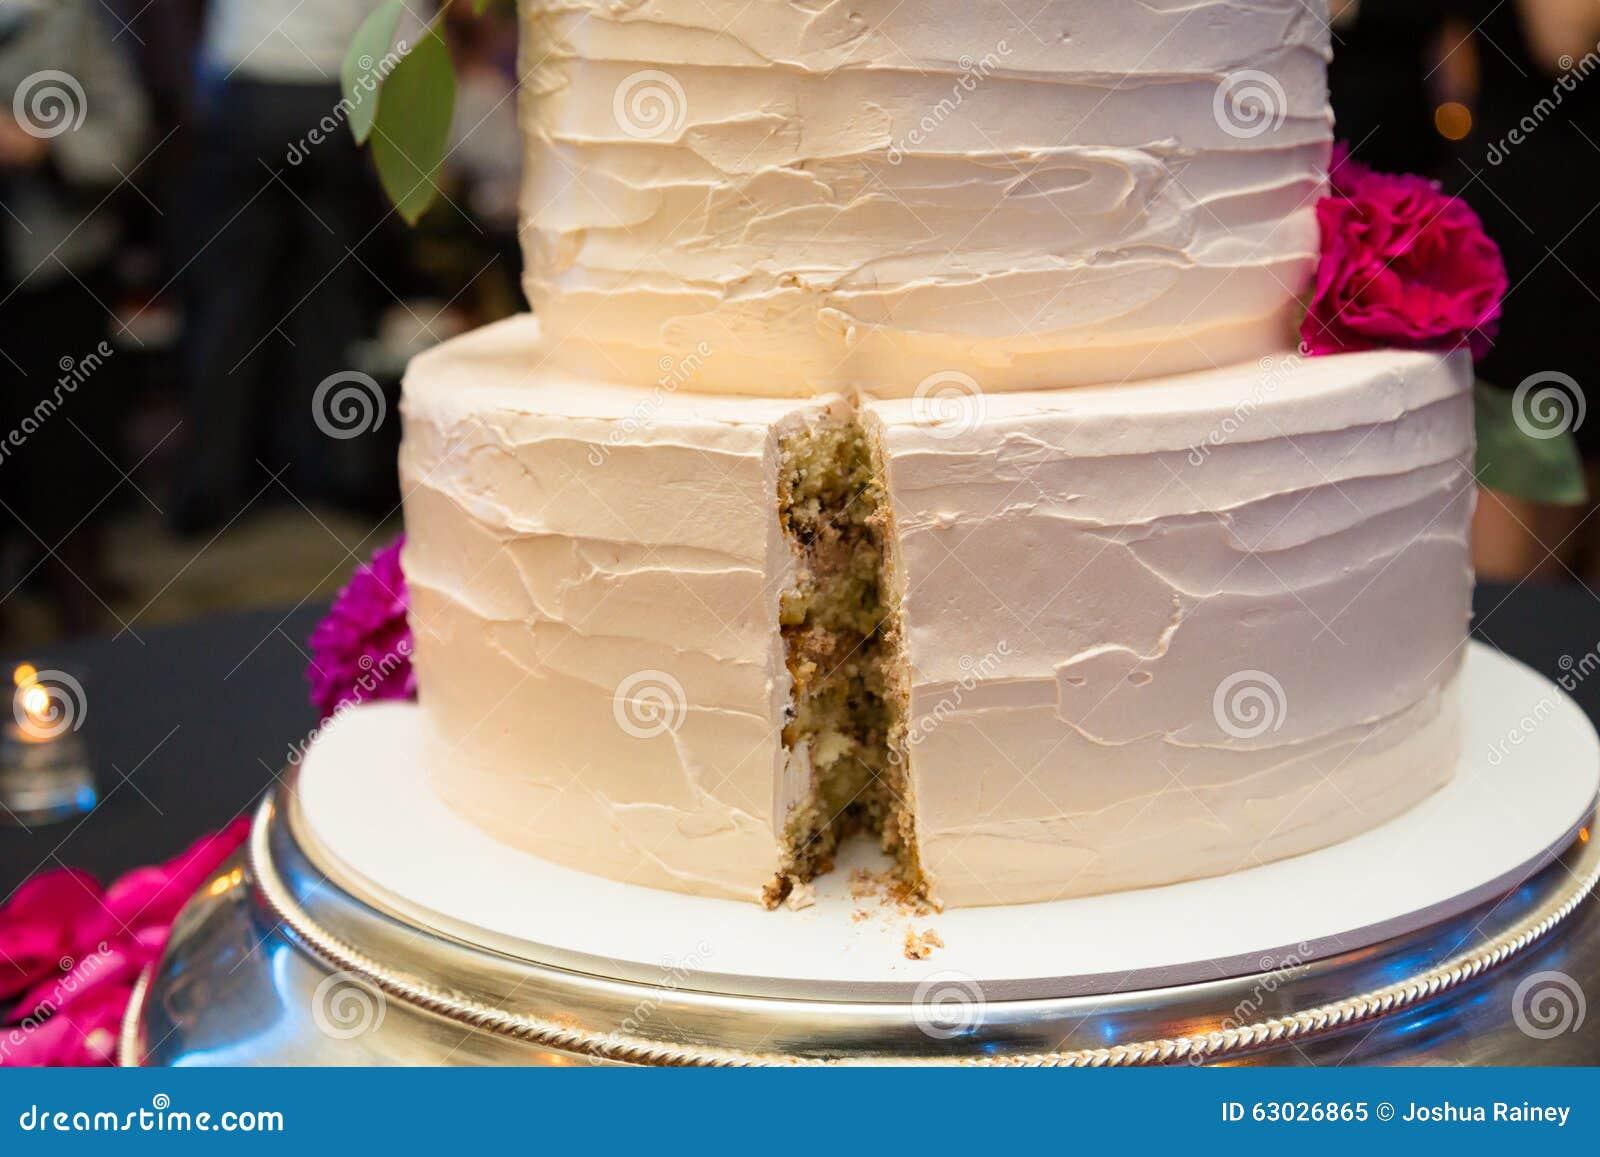 Cut Wedding Cake Before Dinner